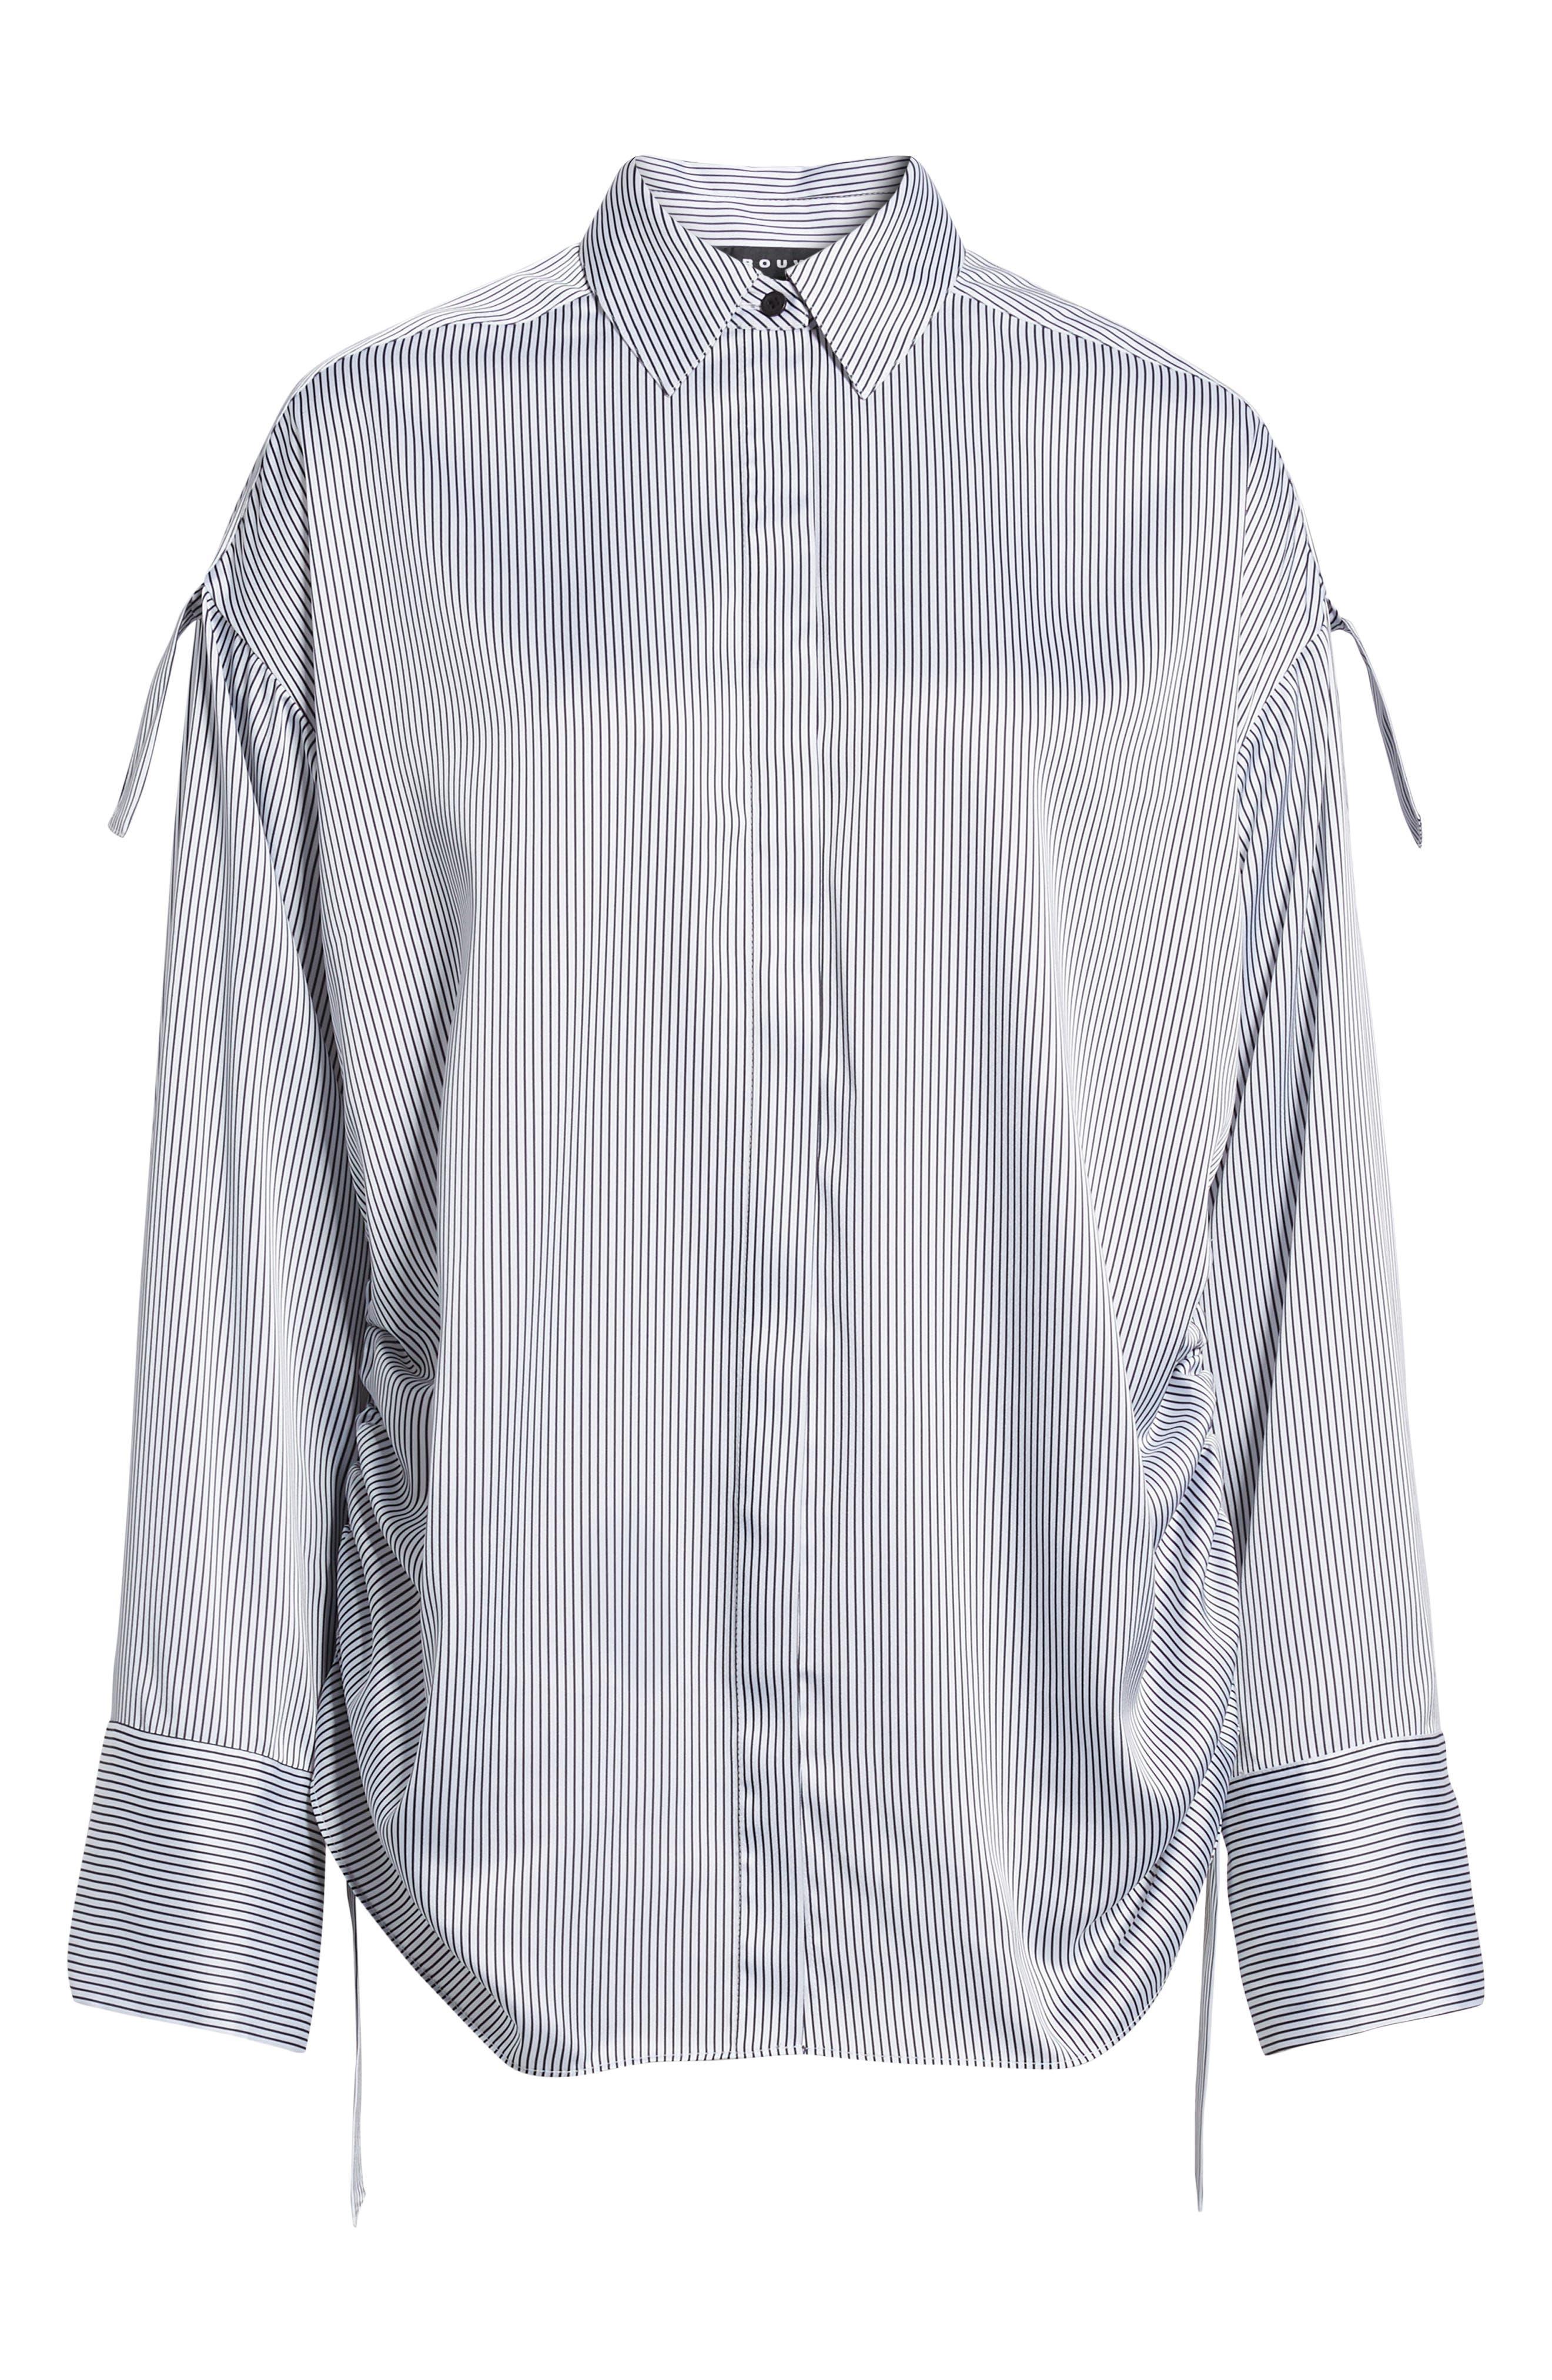 Tie Sleeve Satin Top,                             Alternate thumbnail 6, color,                             White/ Black Maisy Stripe